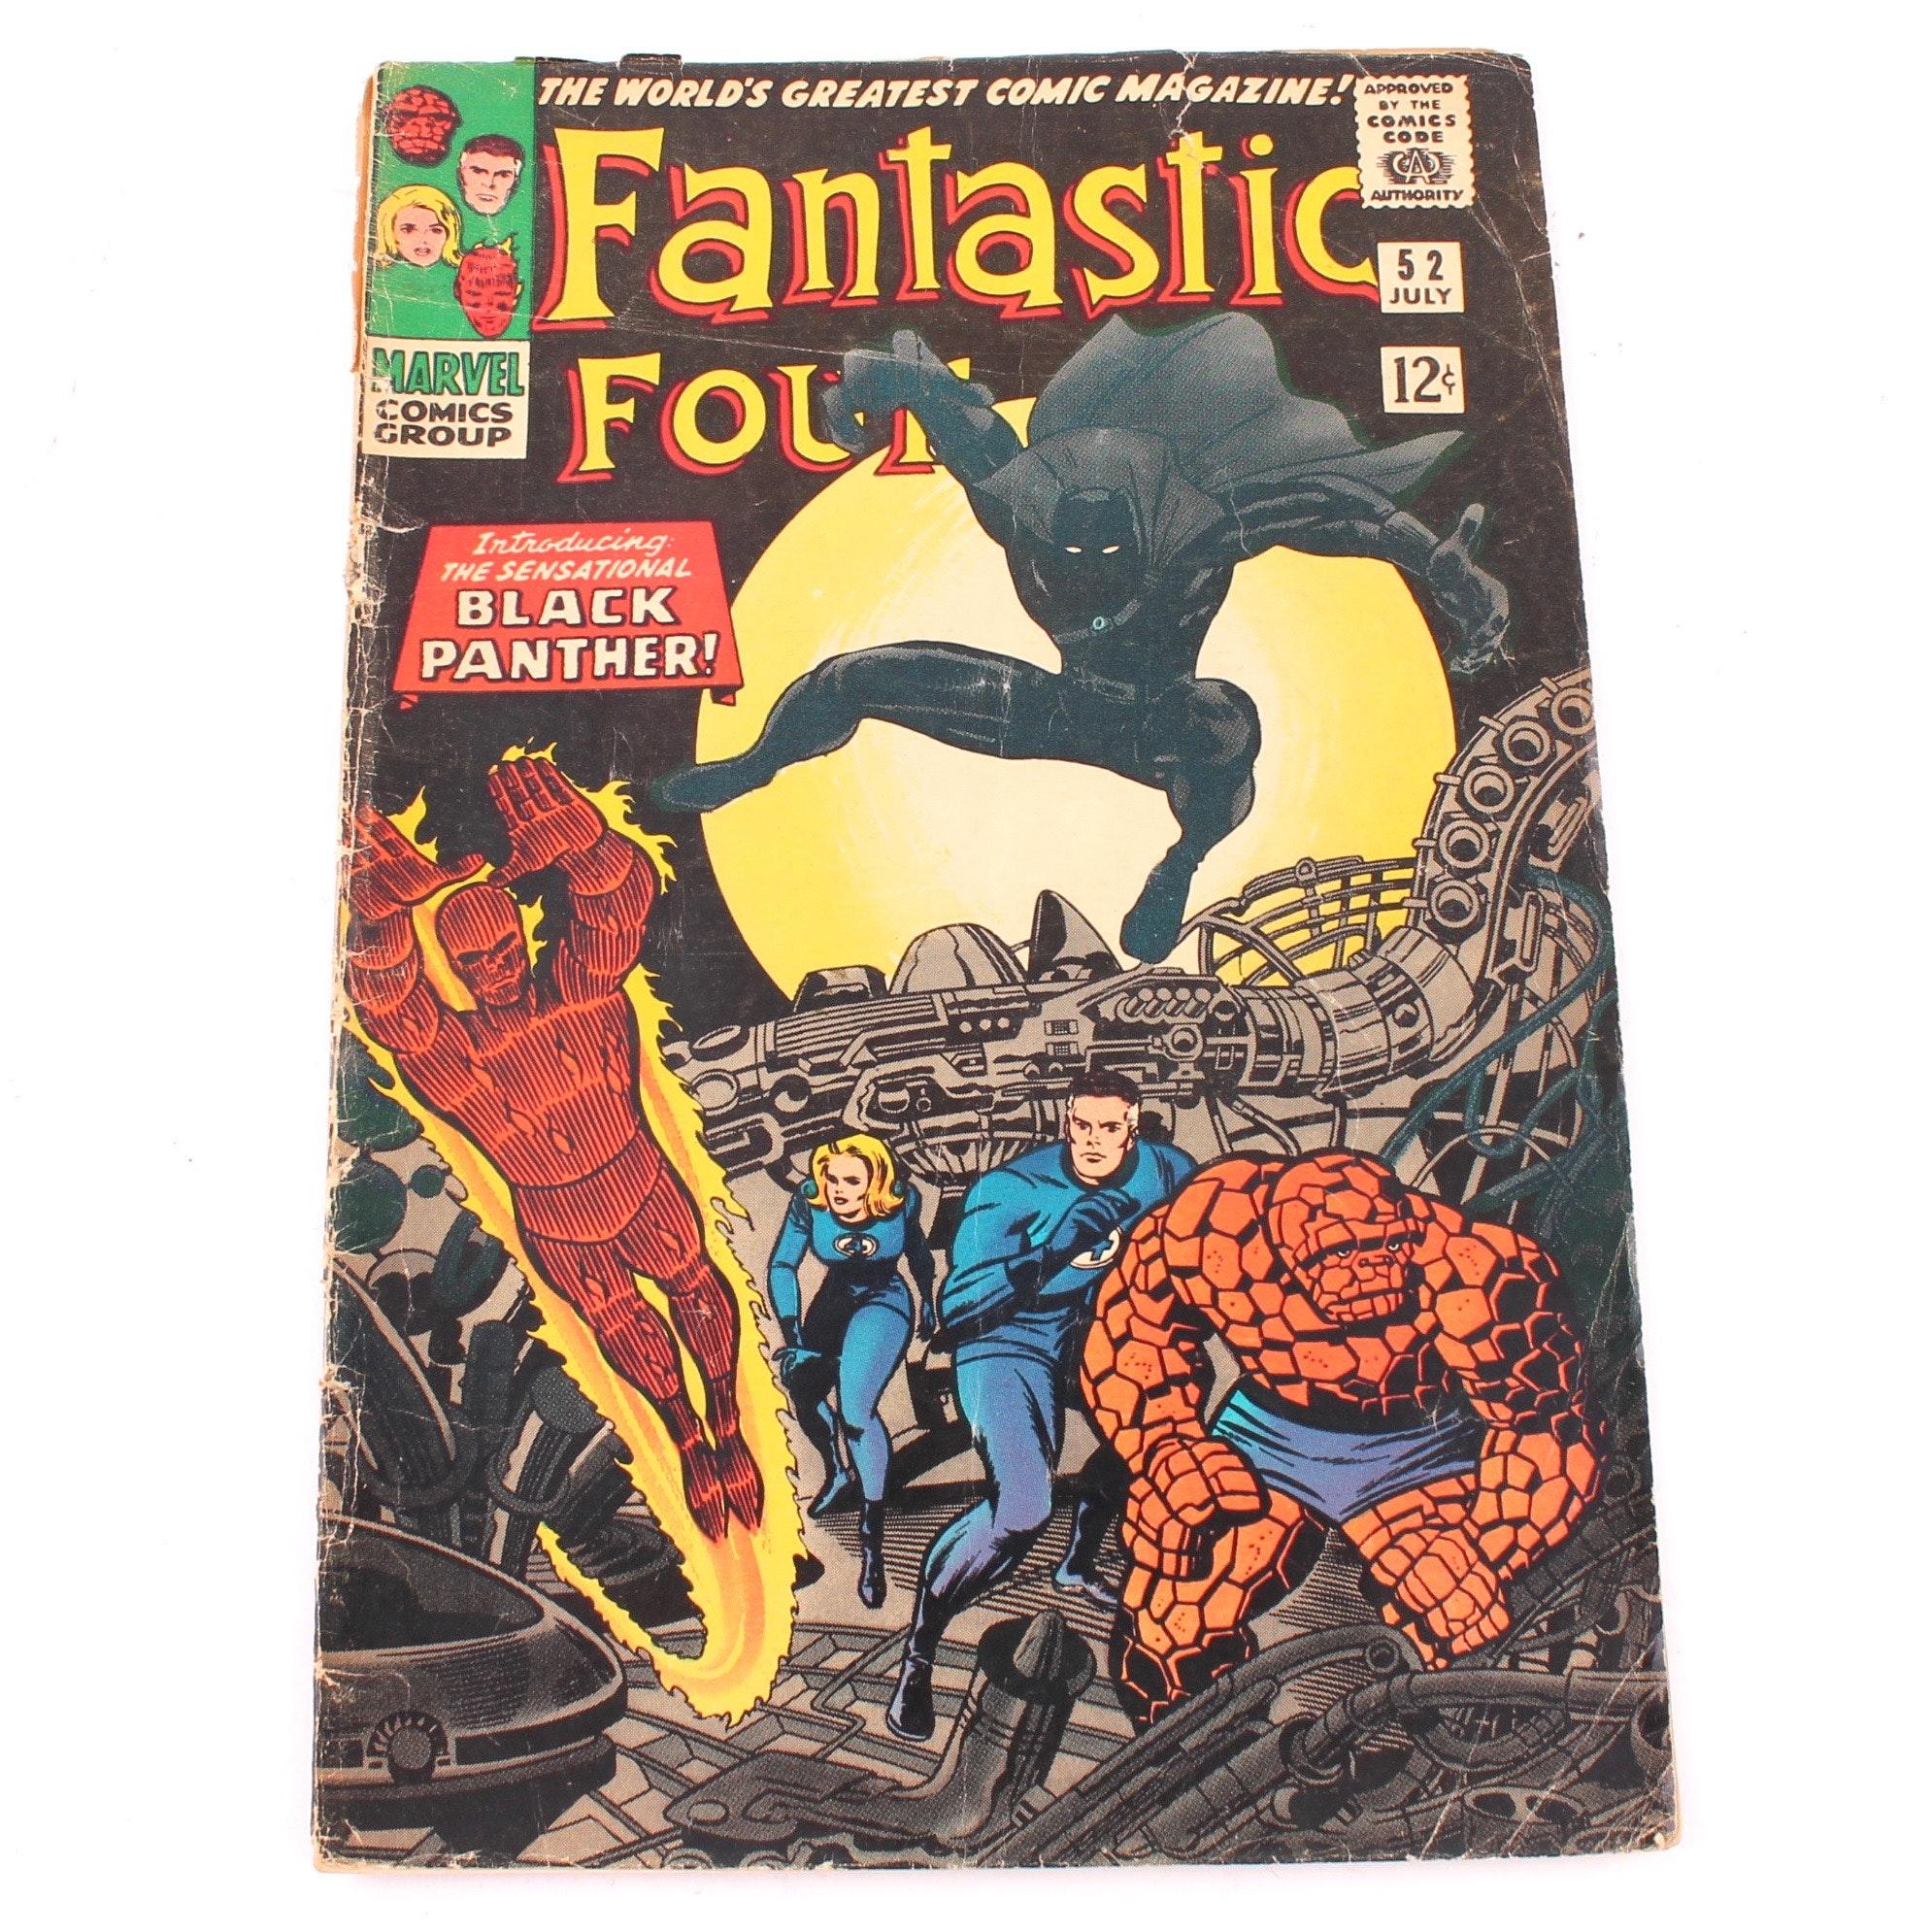 "1966 Fantastic Four #52 ""Introducing Black Panther"" Comic"